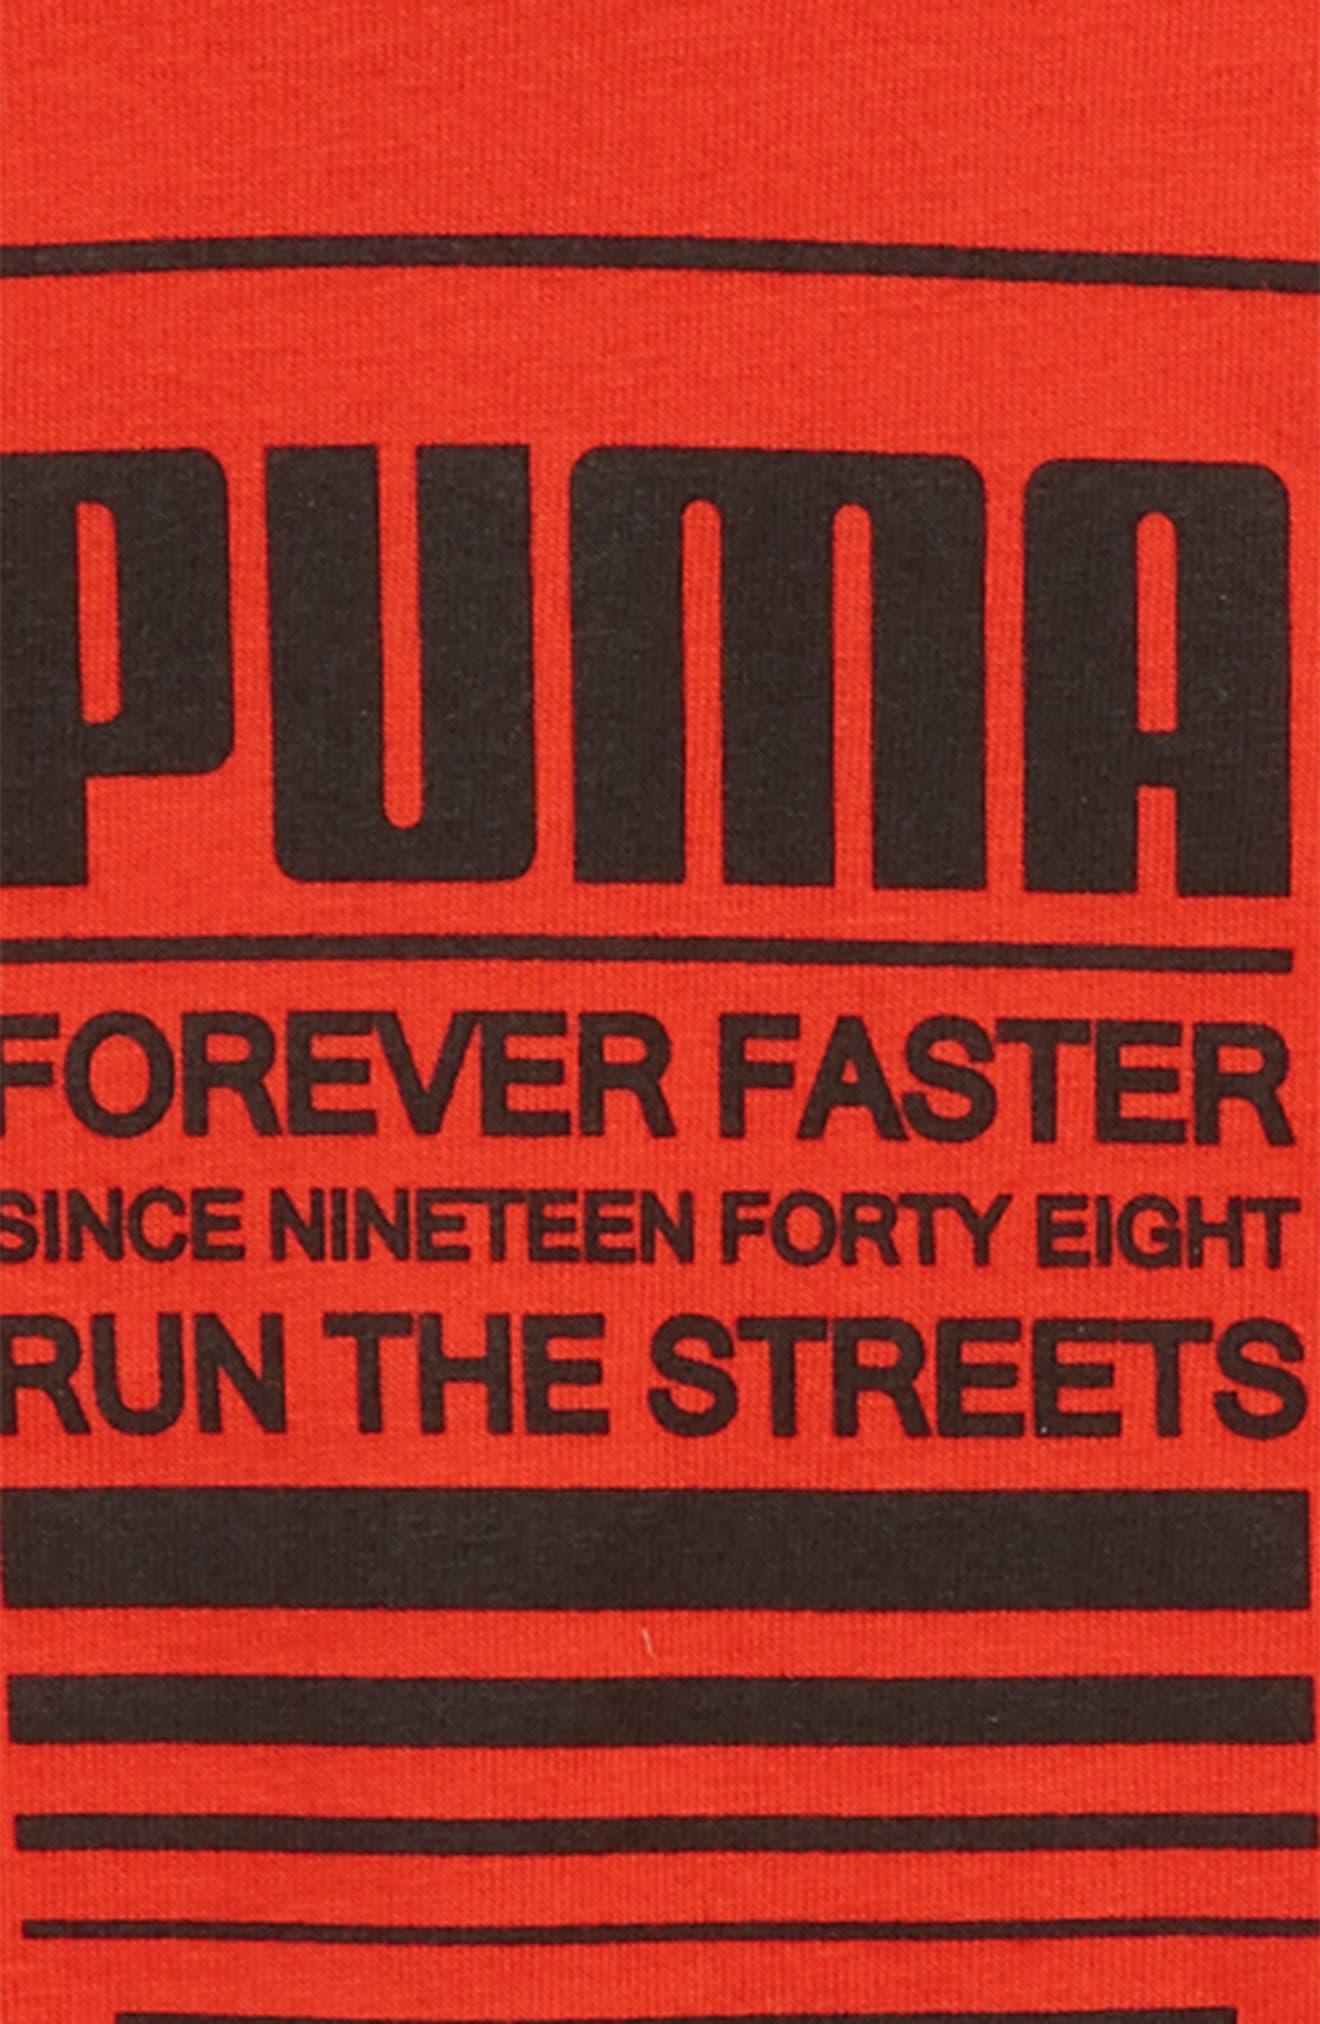 Forever Faster Screenprint T-Shirt,                             Alternate thumbnail 2, color,                             Flame Scarlet